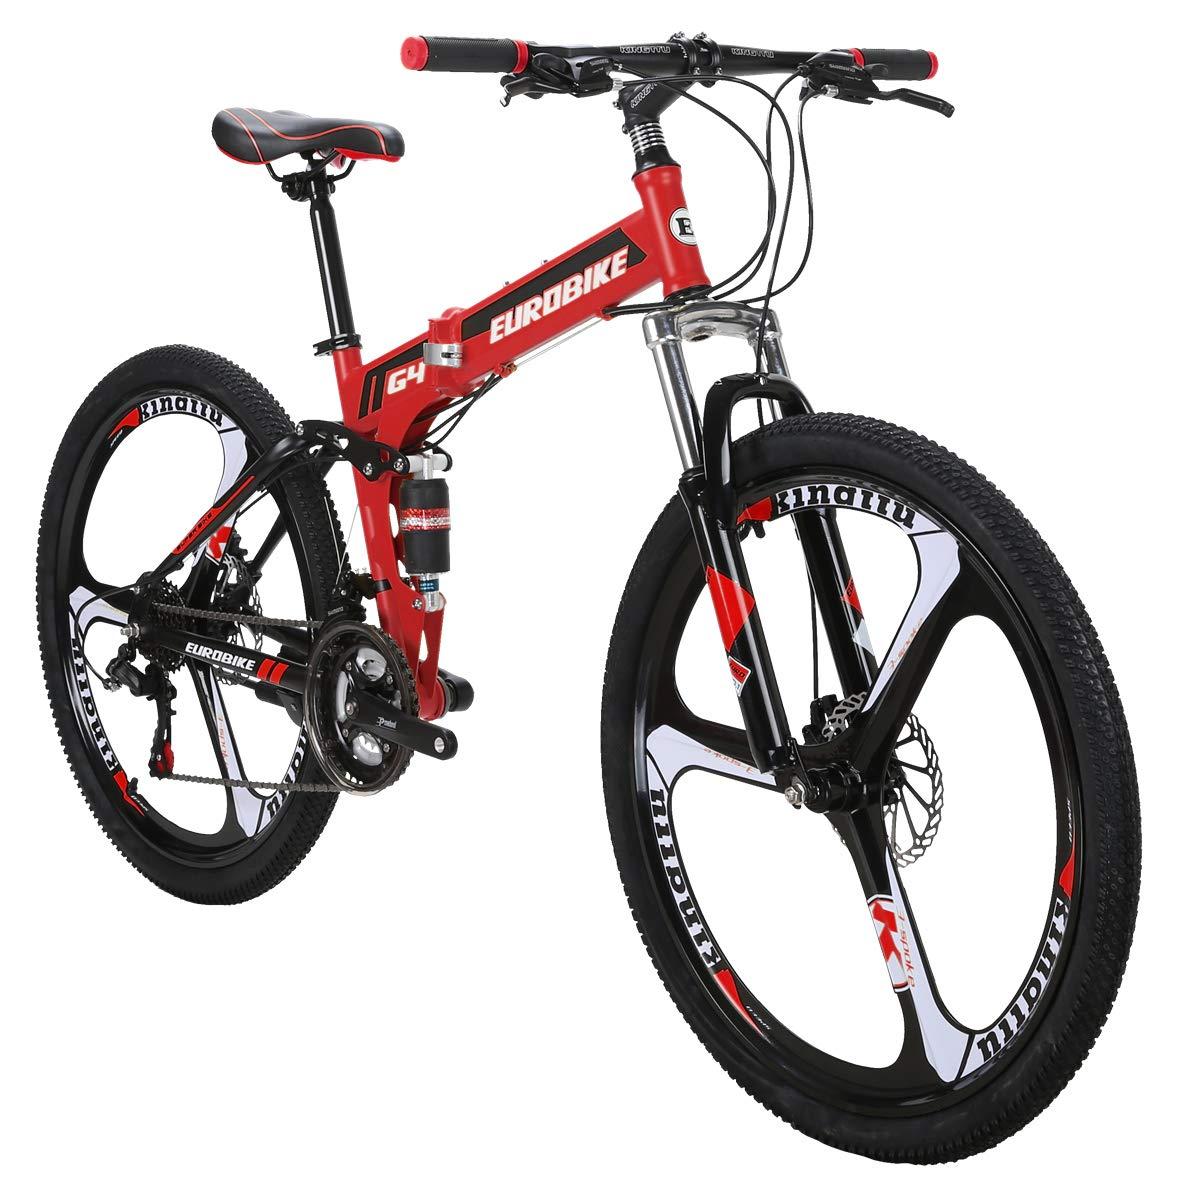 Eurobike G4 - Bicicleta de montaña de 21 velocidades, Estructura de Acero, Ruedas de 26 Pulgadas, Doble suspensión, Bicicleta Plegable, Rojo: Amazon.es: ...